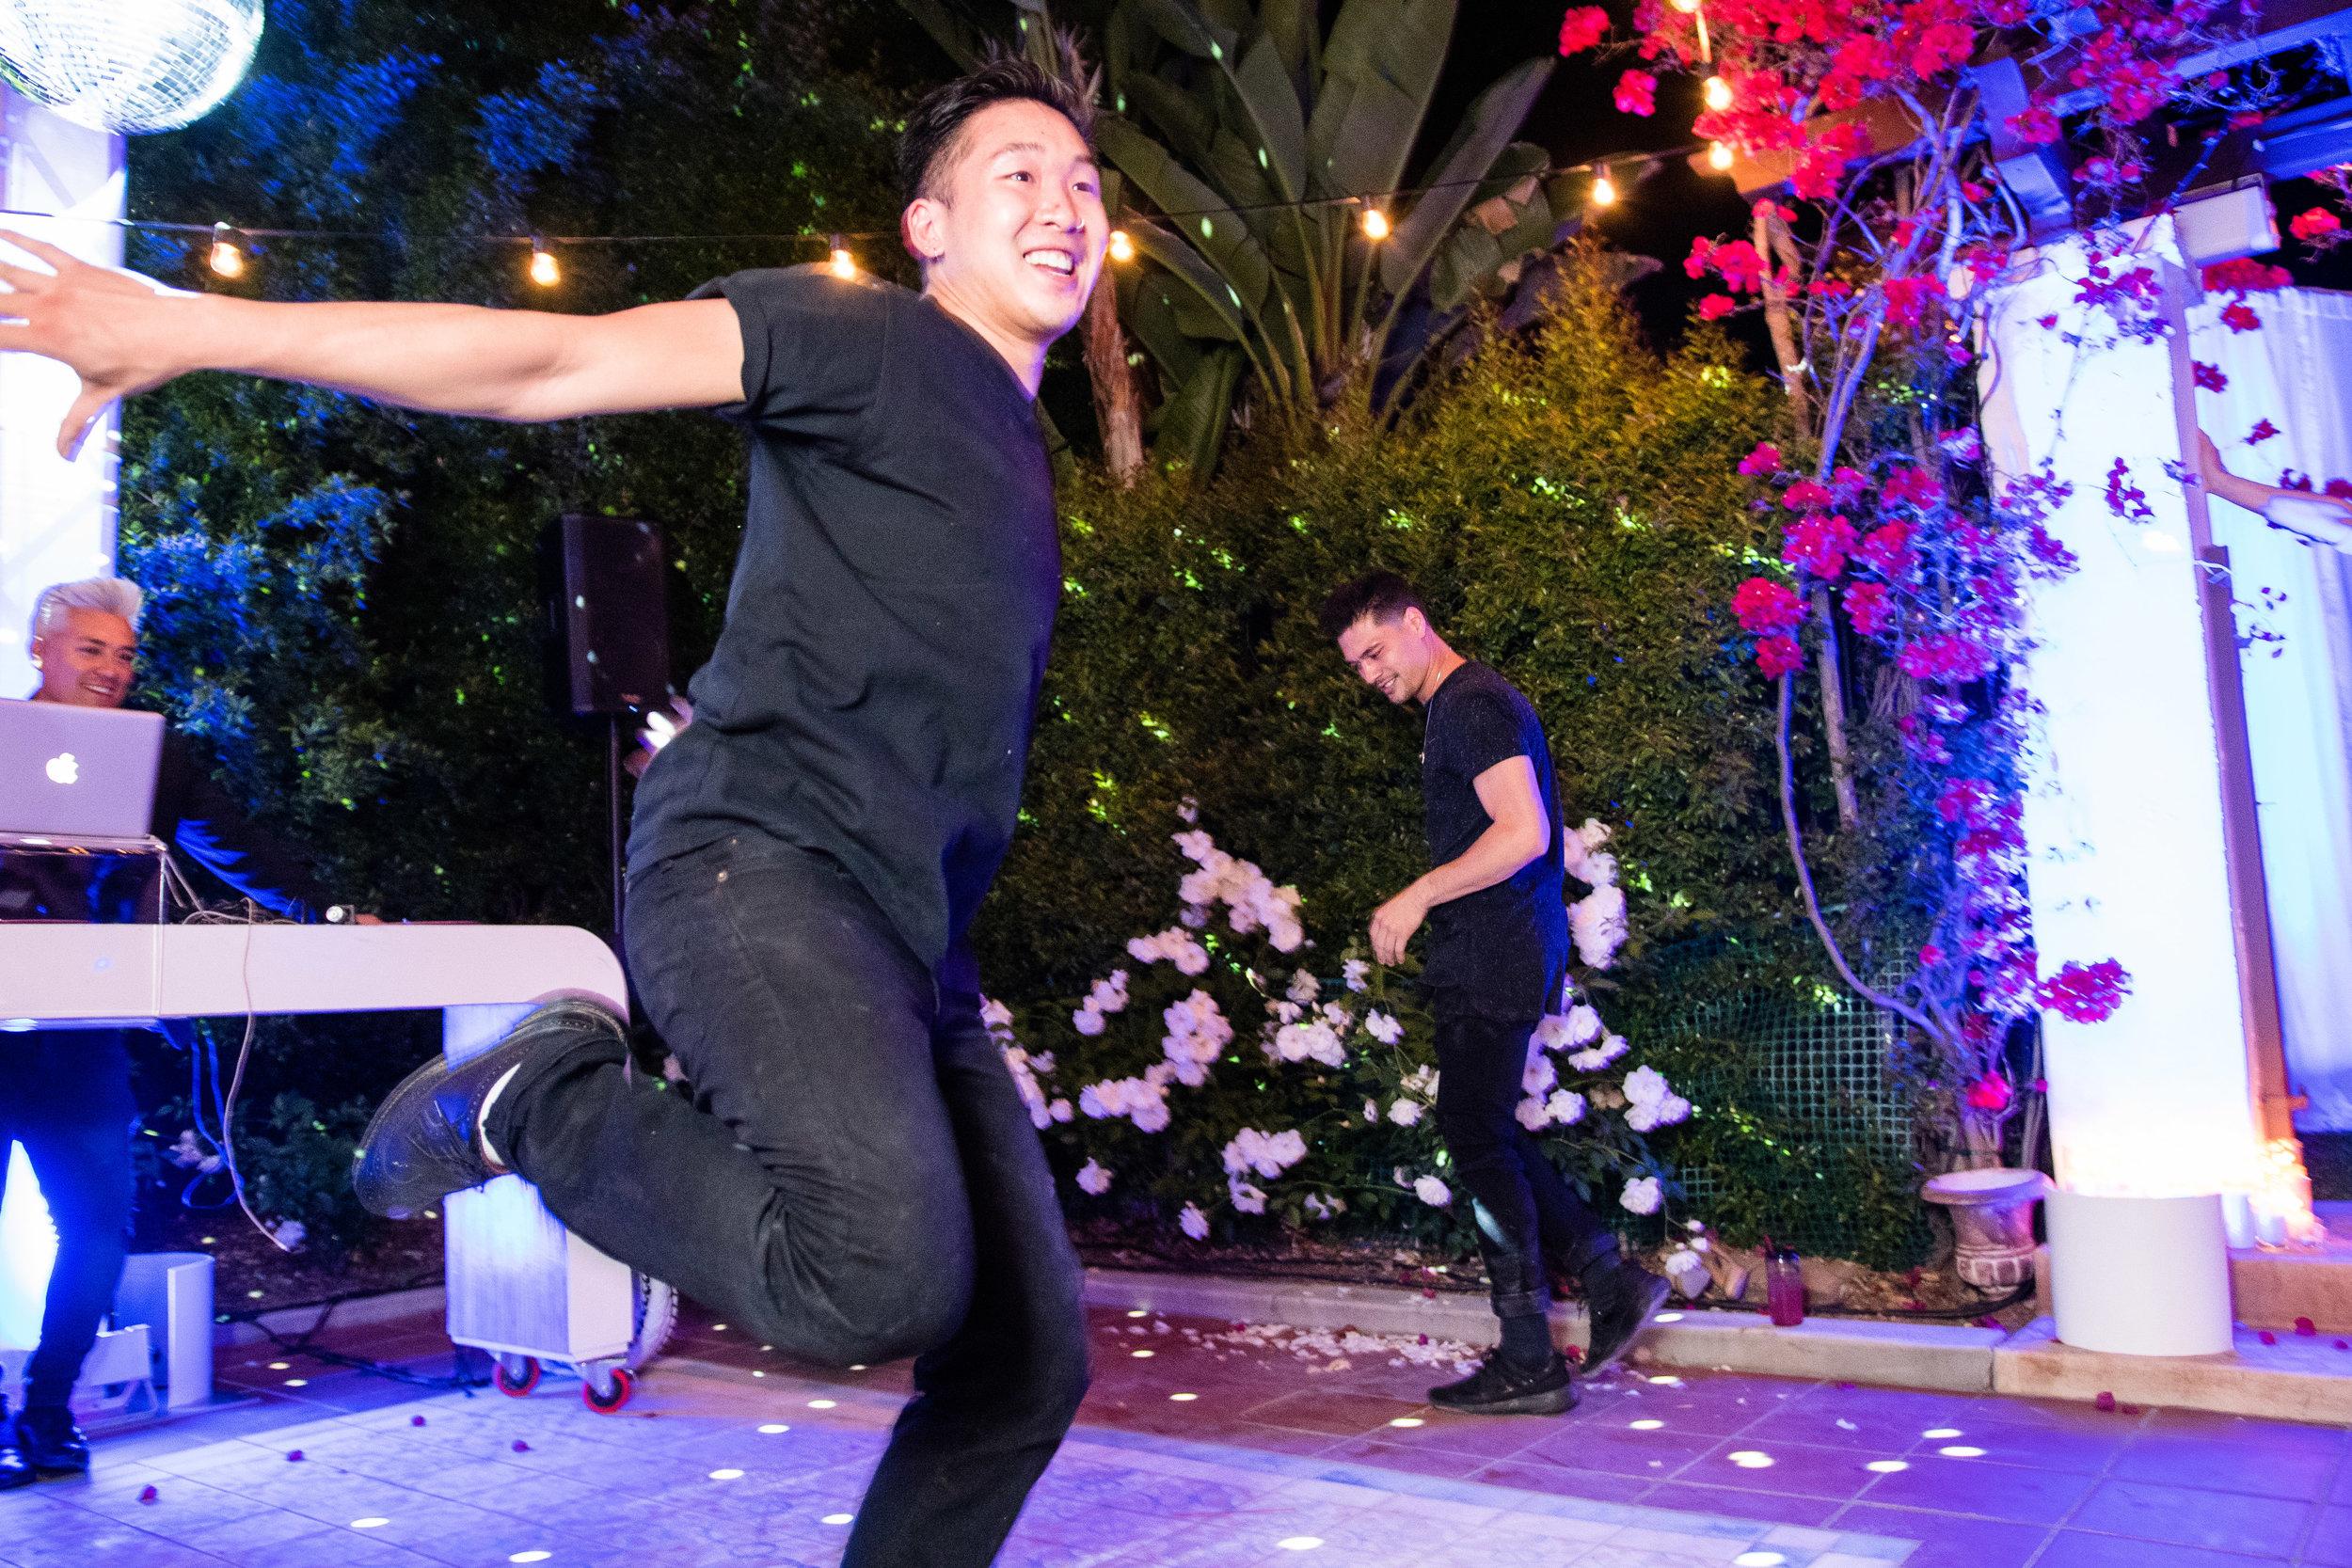 Vibrant Fiesta Backyard Wedding Reception break dancers on the dance floor.jpg